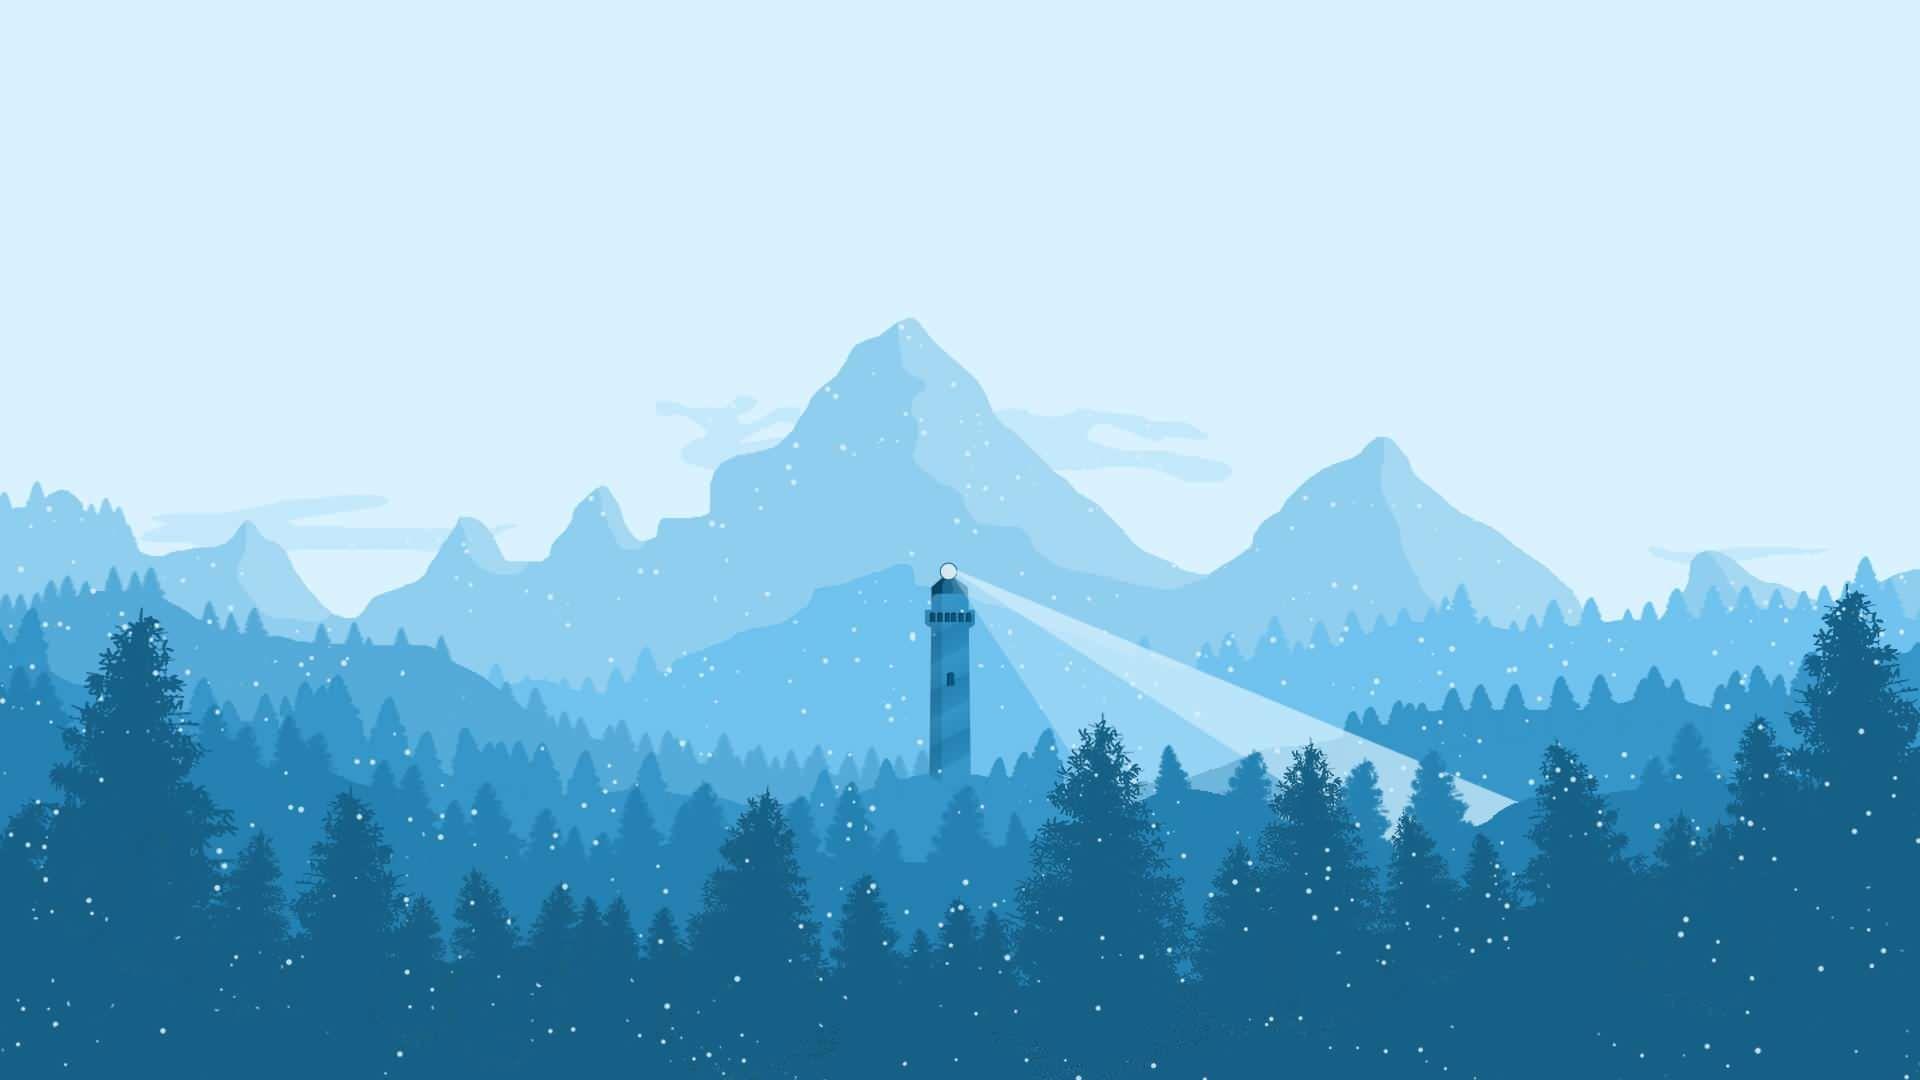 Snow Minimalist Wallpapers - Top Free ...